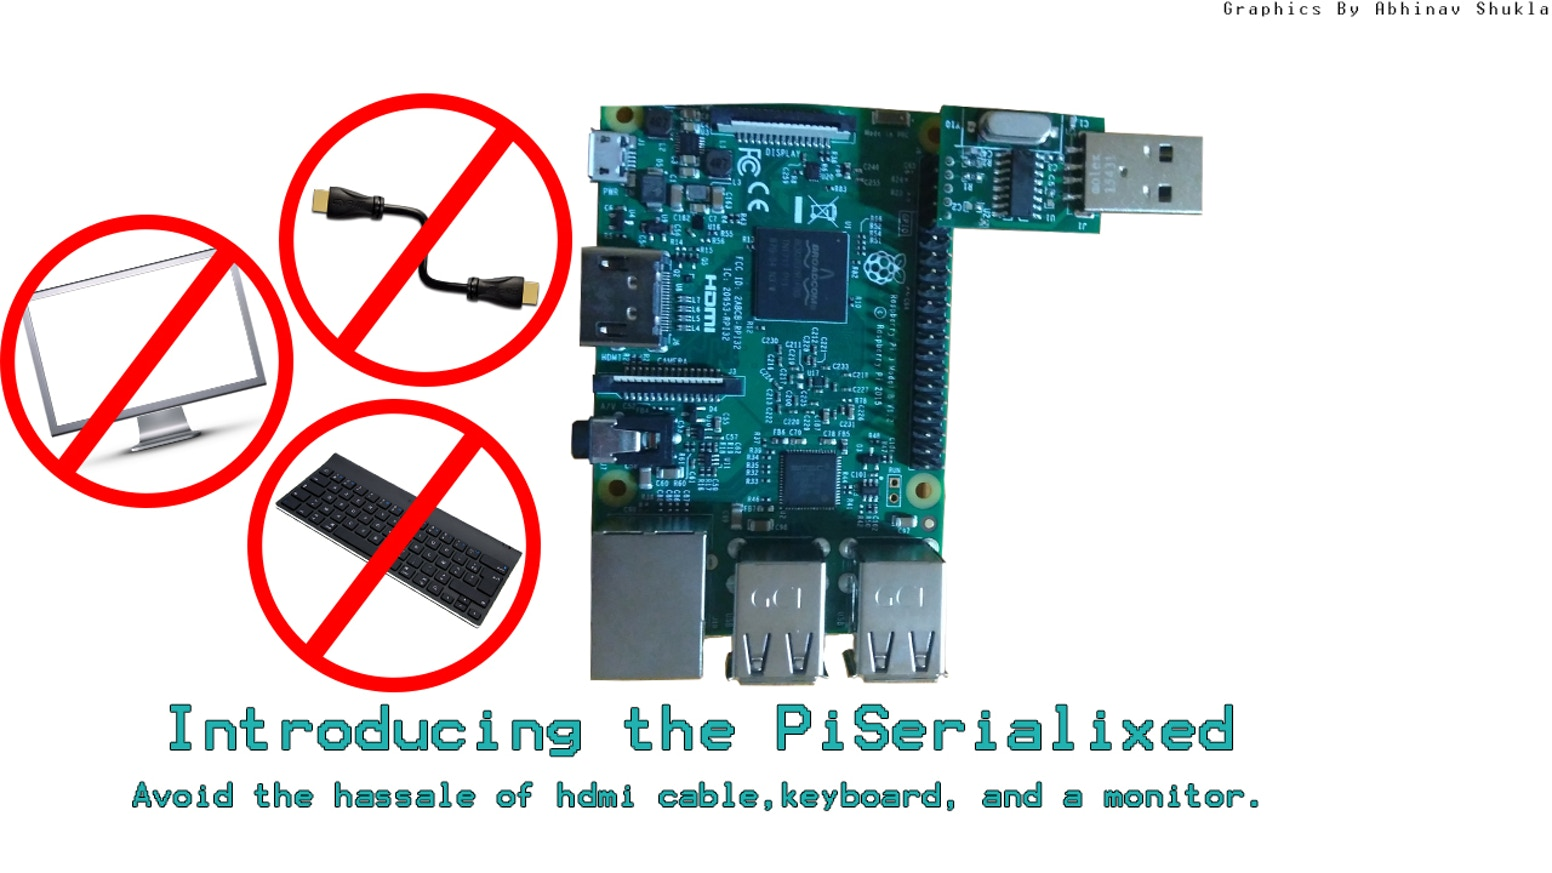 PiSerialixed - Raspberry Pi 3 UART USB Board by Vikas Shukla